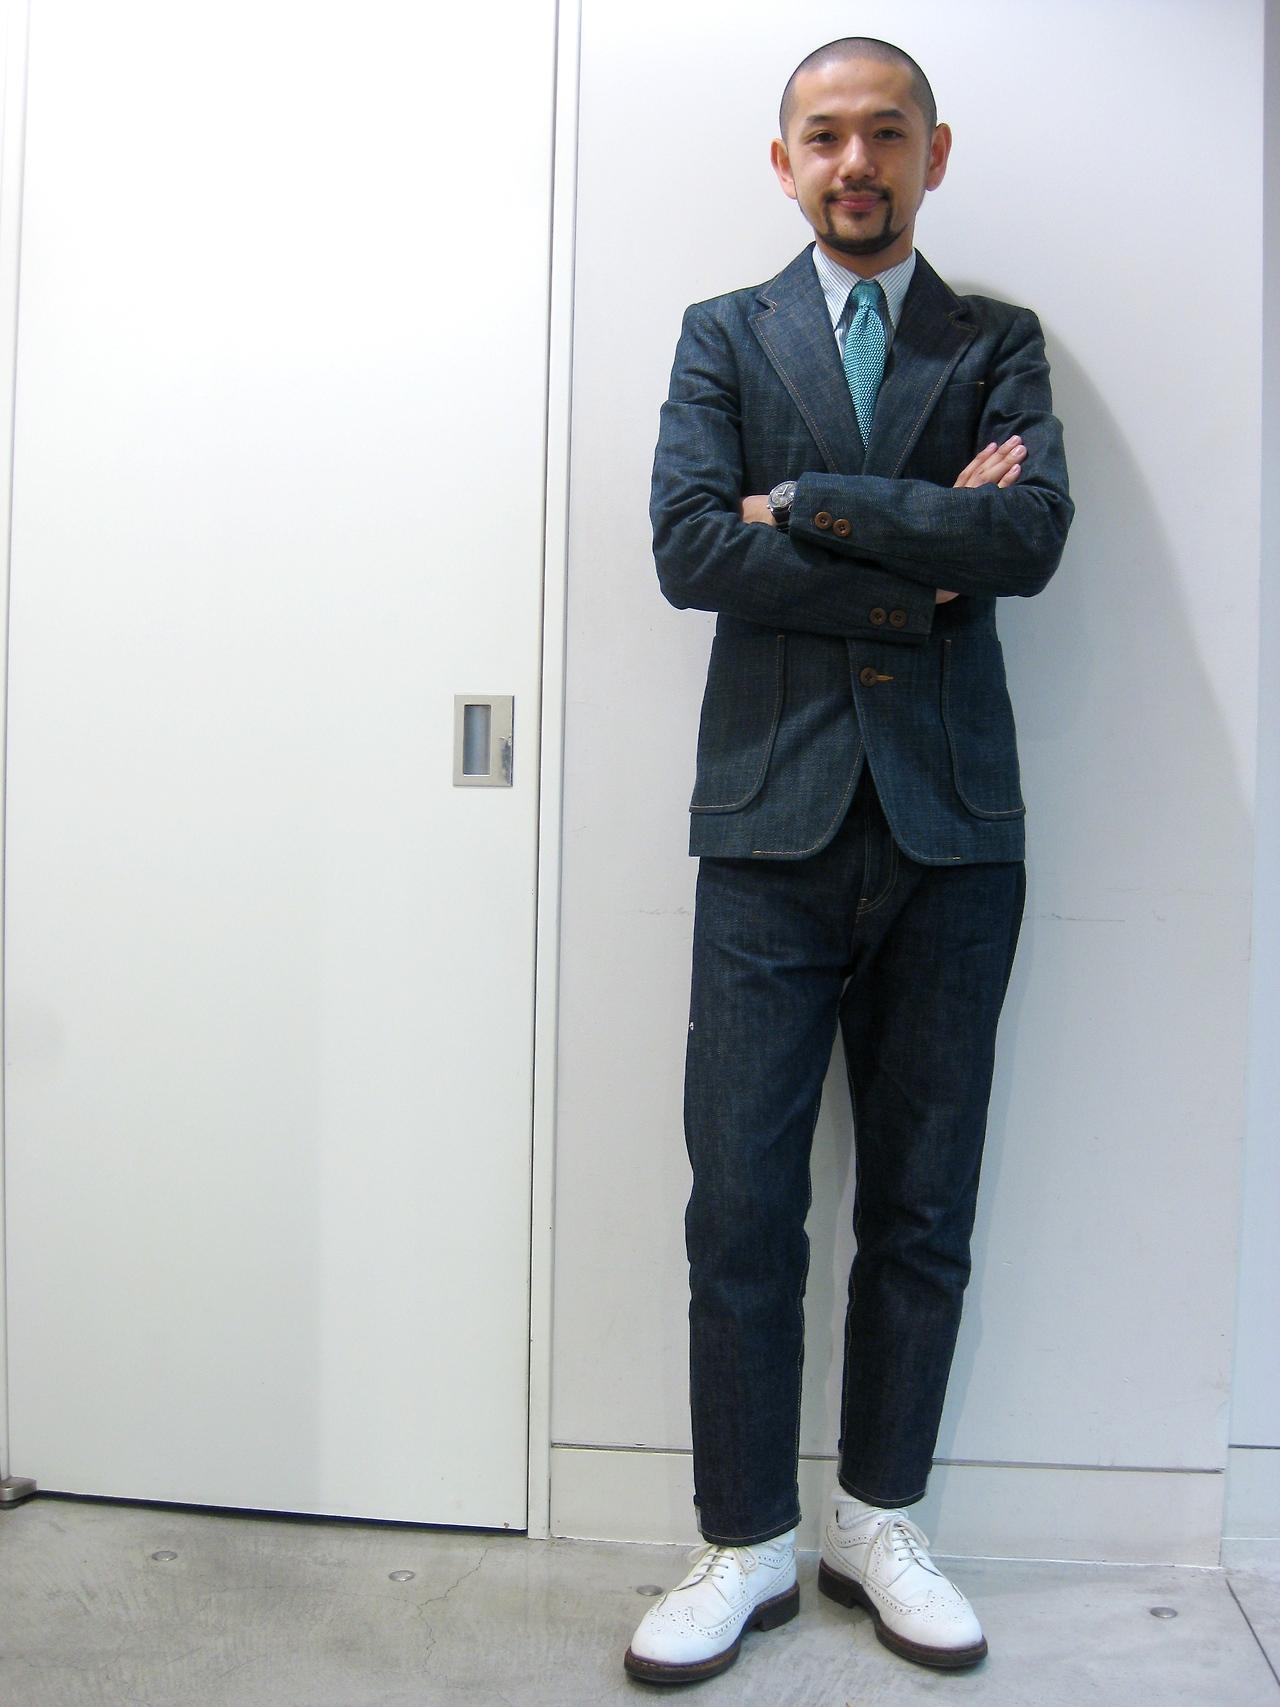 Denim-jacket-jeans-men-style-lookbook-white-shoes U2013 Fabrickated